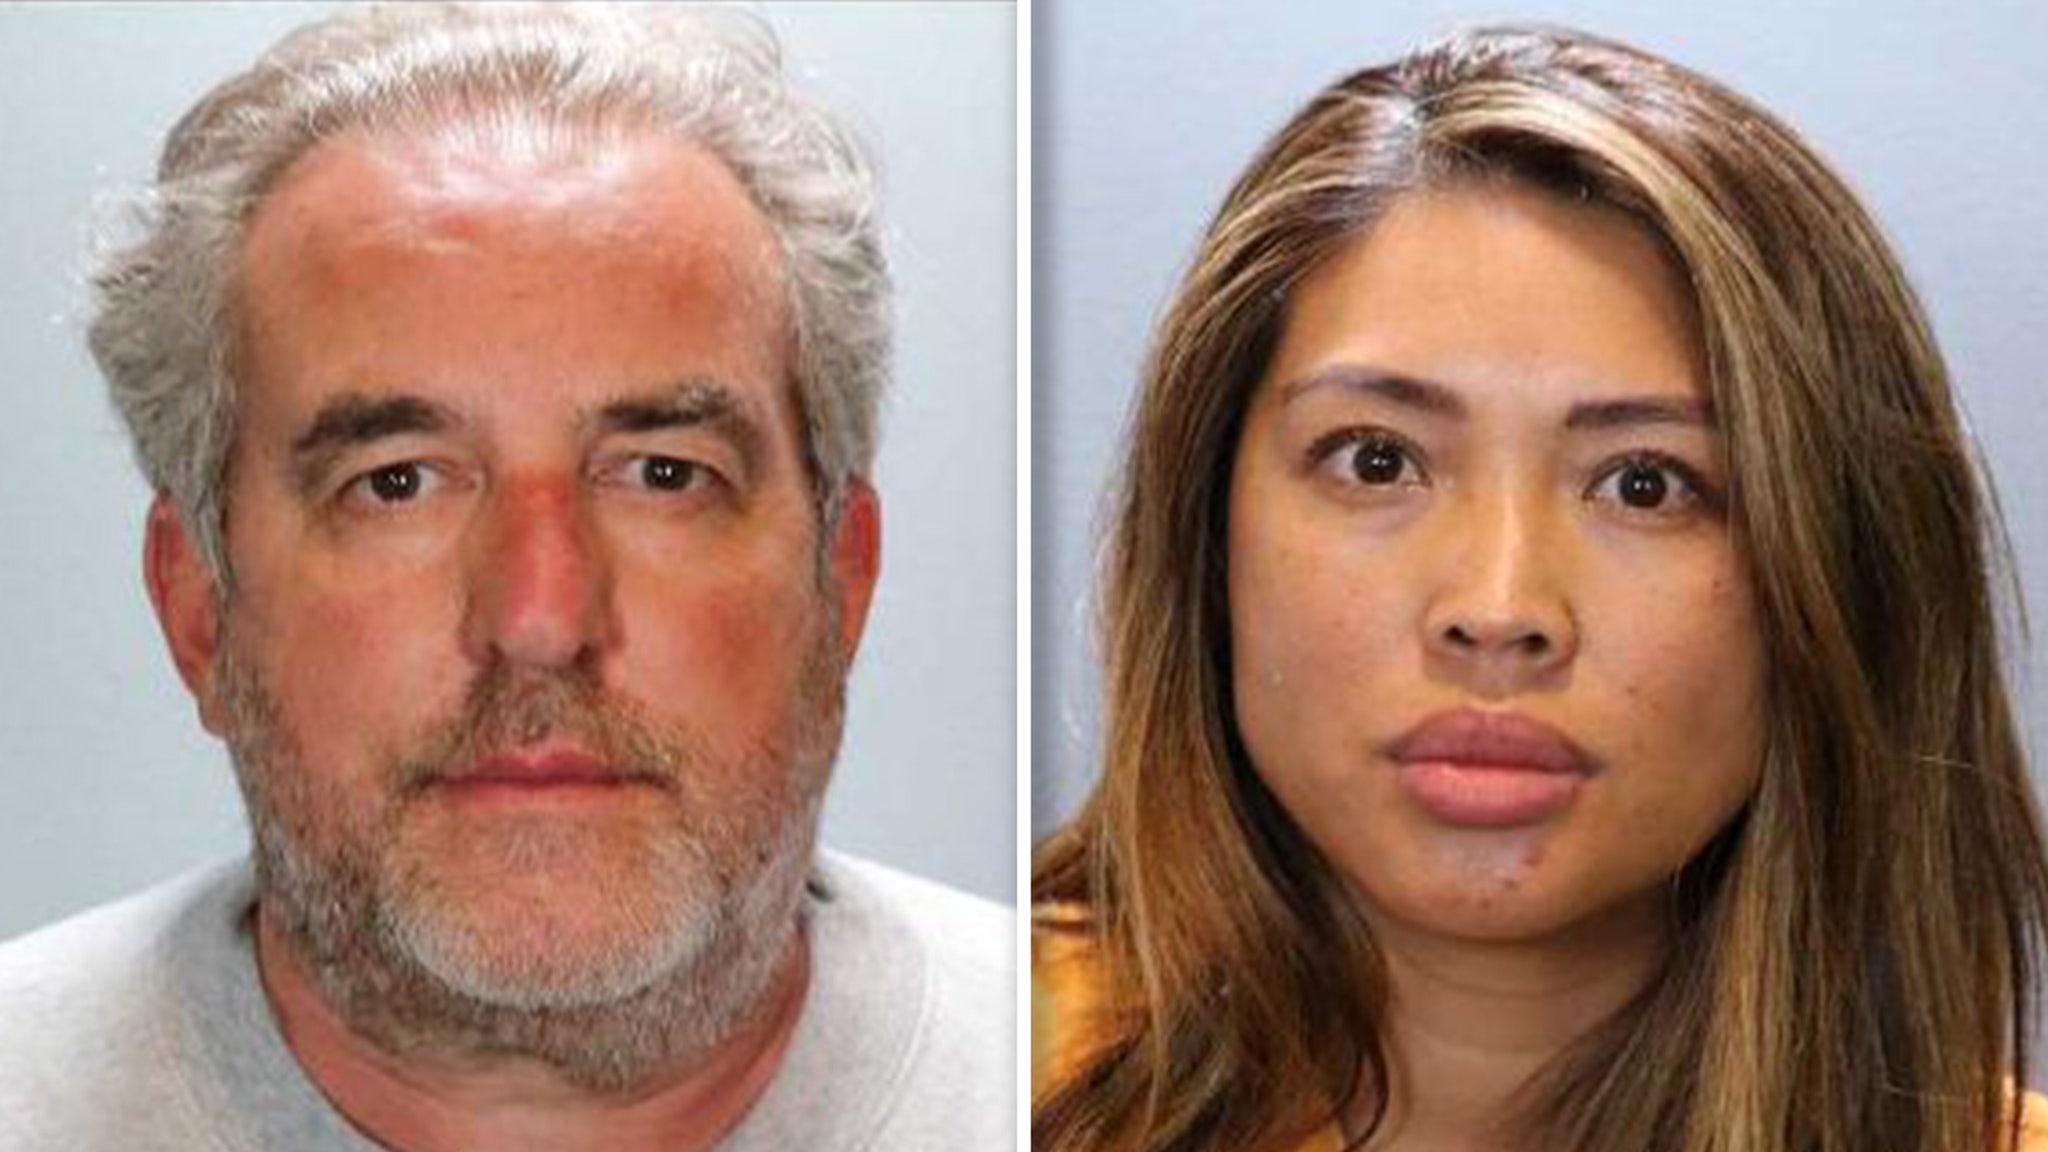 Beverly Hills Surgeon & GF Charged in $52 Mil Insurance Fraud Scheme ... New Mug Shots